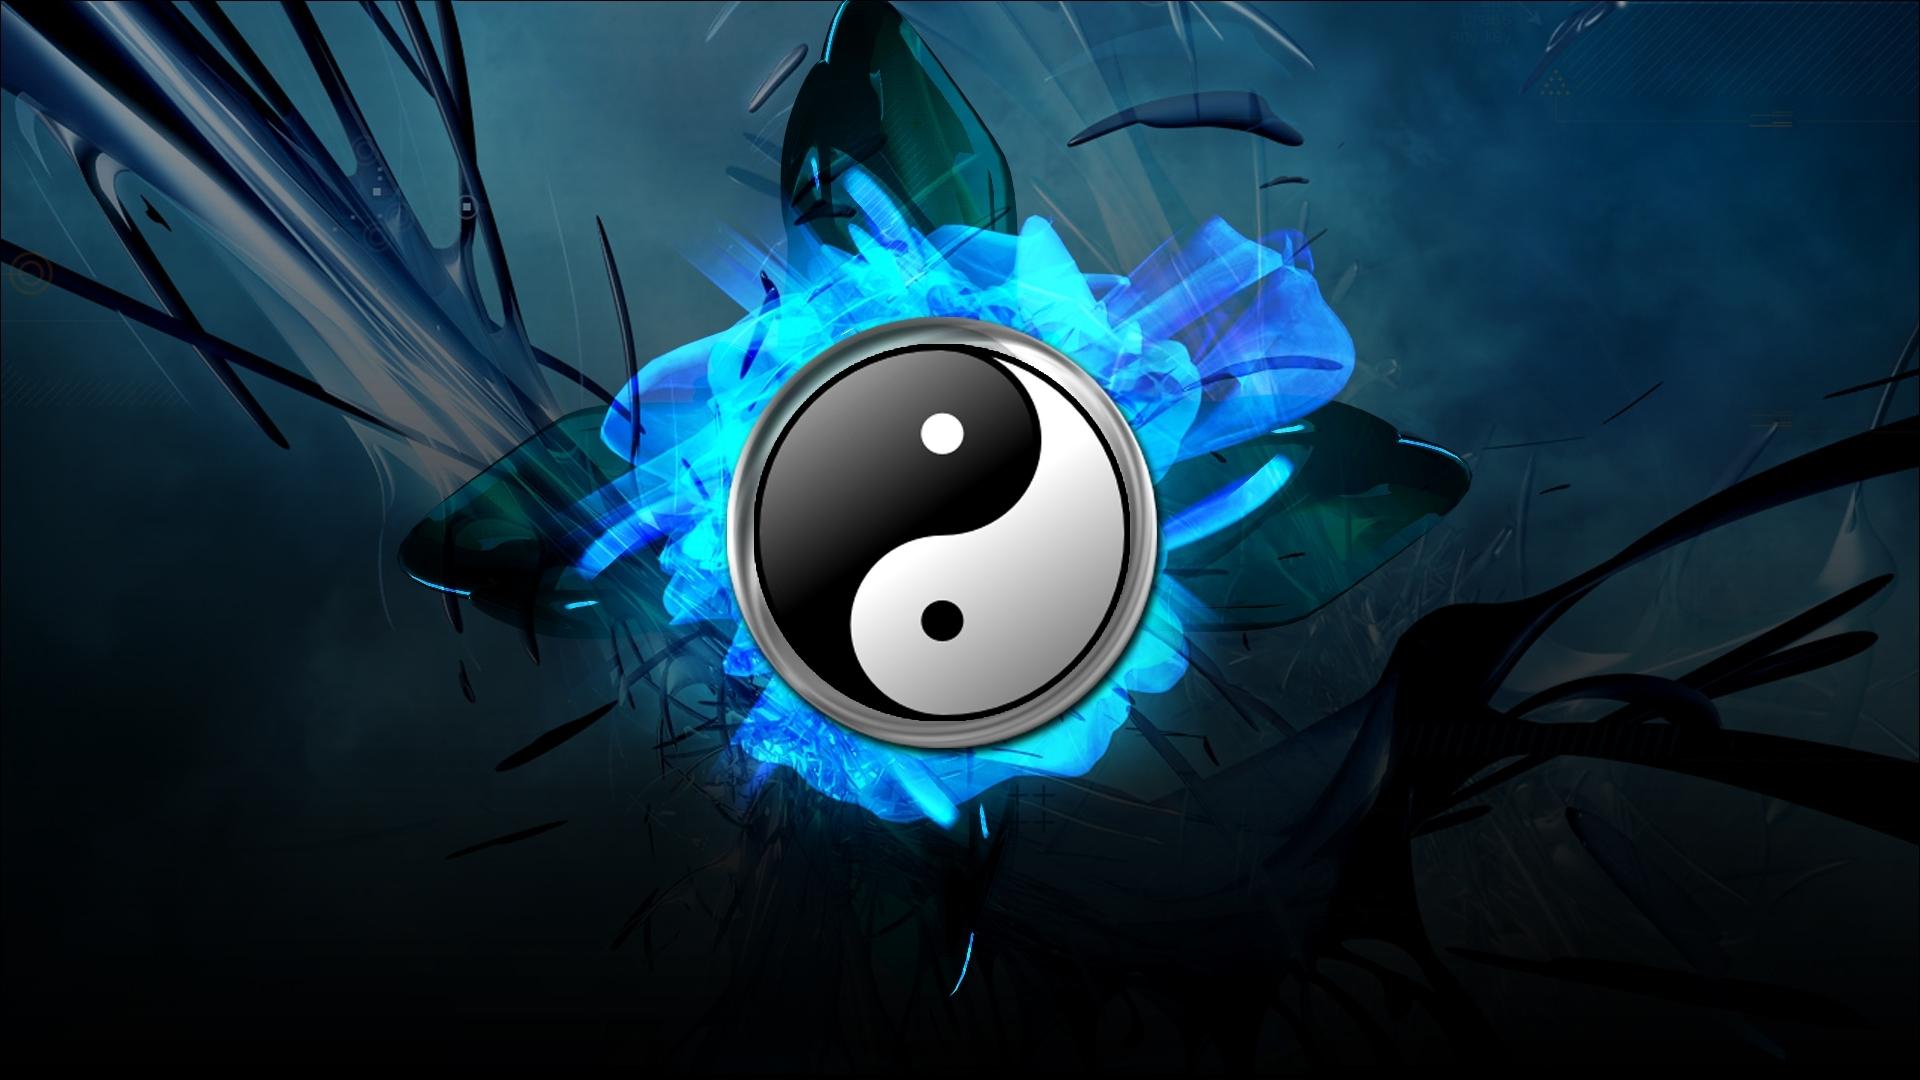 cool yin yang wallpaper full hd. - media file | pixelstalk